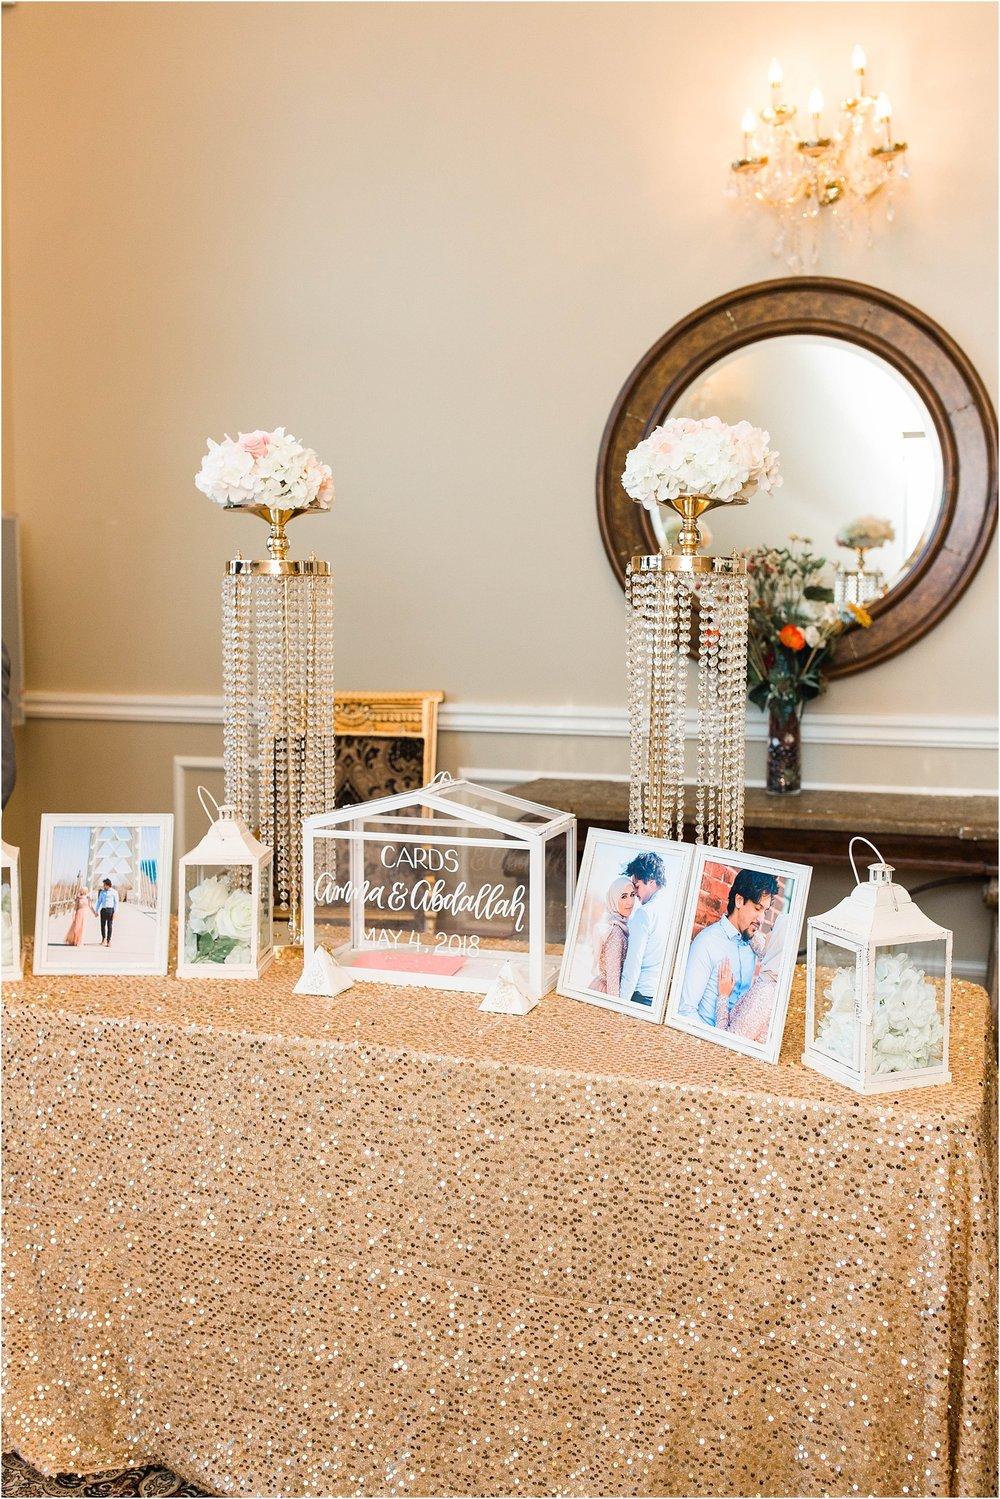 Red-Rose-Convention-Mint-Room-Wedding-Toronto-Mississauga-Brampton-Scarborough-GTA-Pakistani-Indian-Wedding-Engagement-Photographer-Photography_0122.jpg